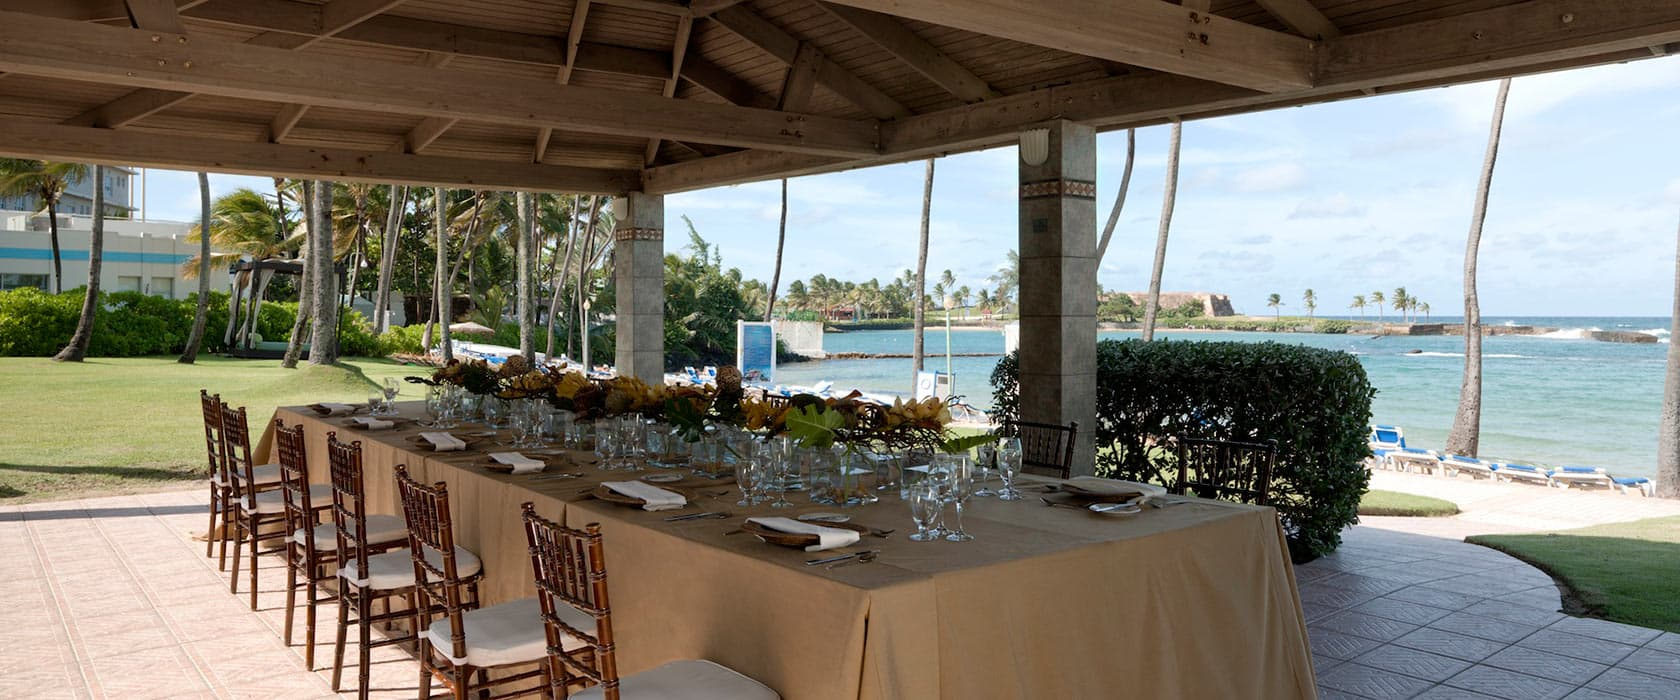 Hilton Caribbean Weddings: Condado Lagoon Villas, San Juan, Puerto Rico